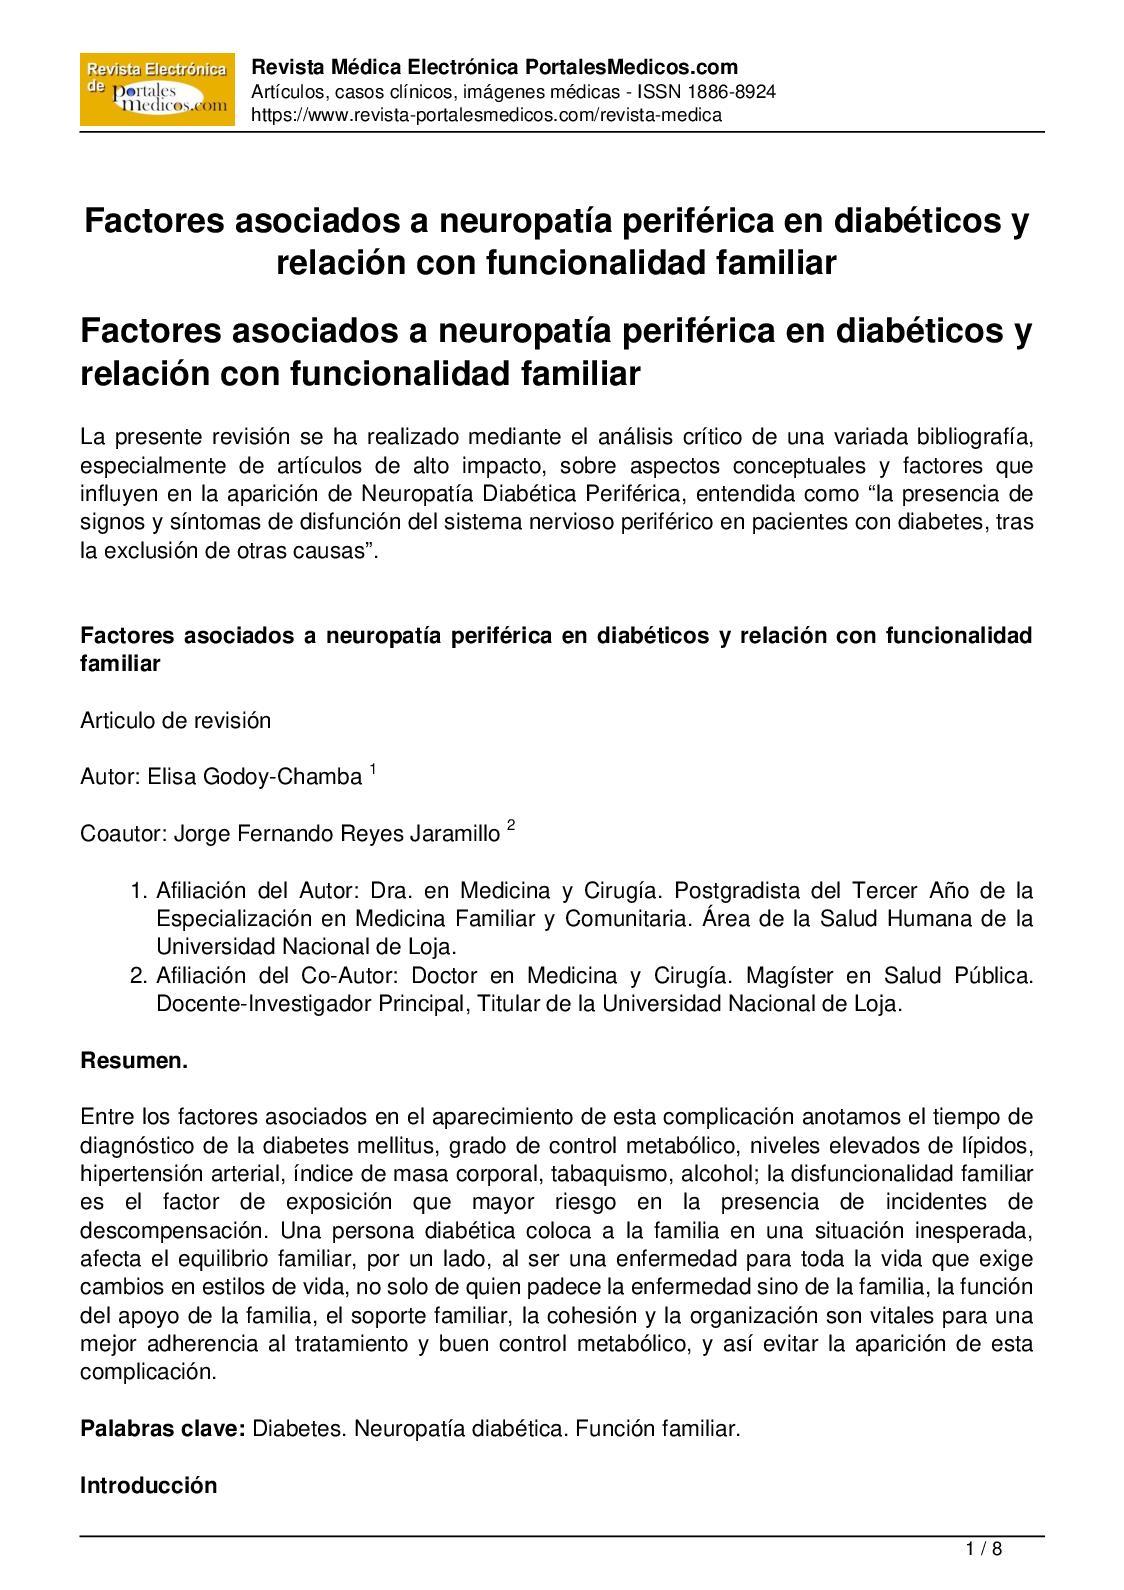 Sin neuropatía diabetes periférica